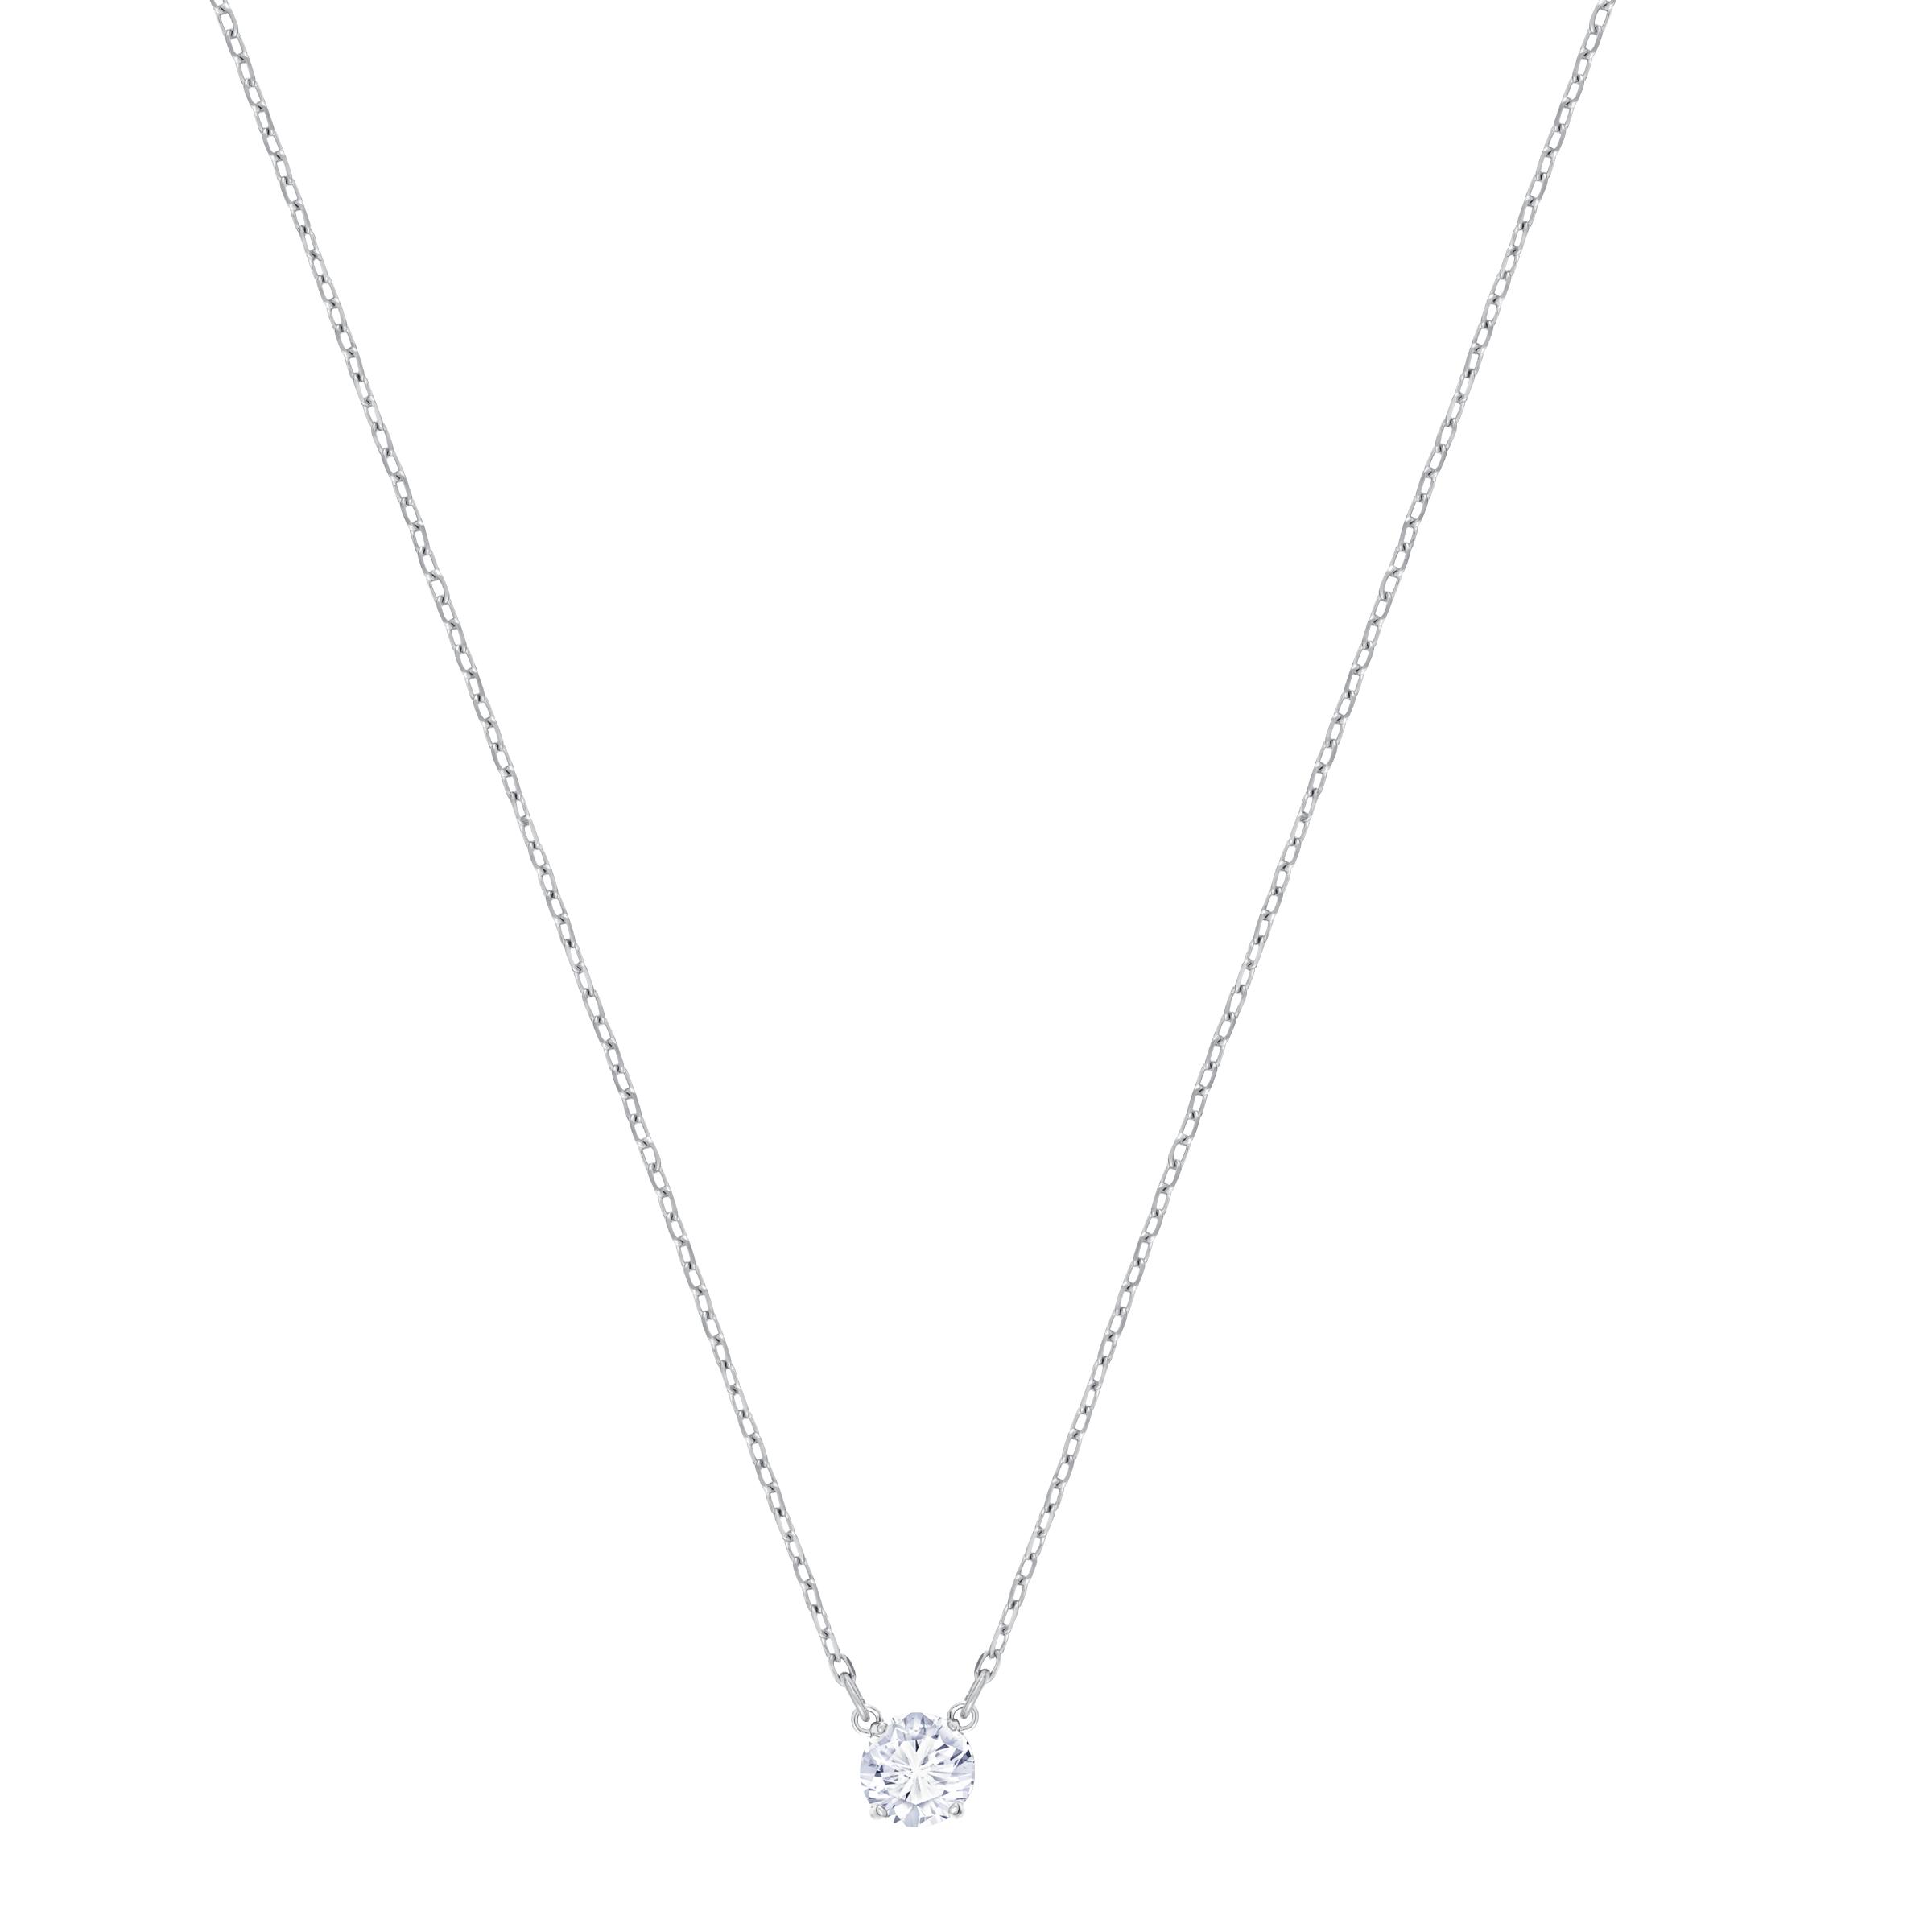 Attract Round Necklace, White, Rhodium Plating